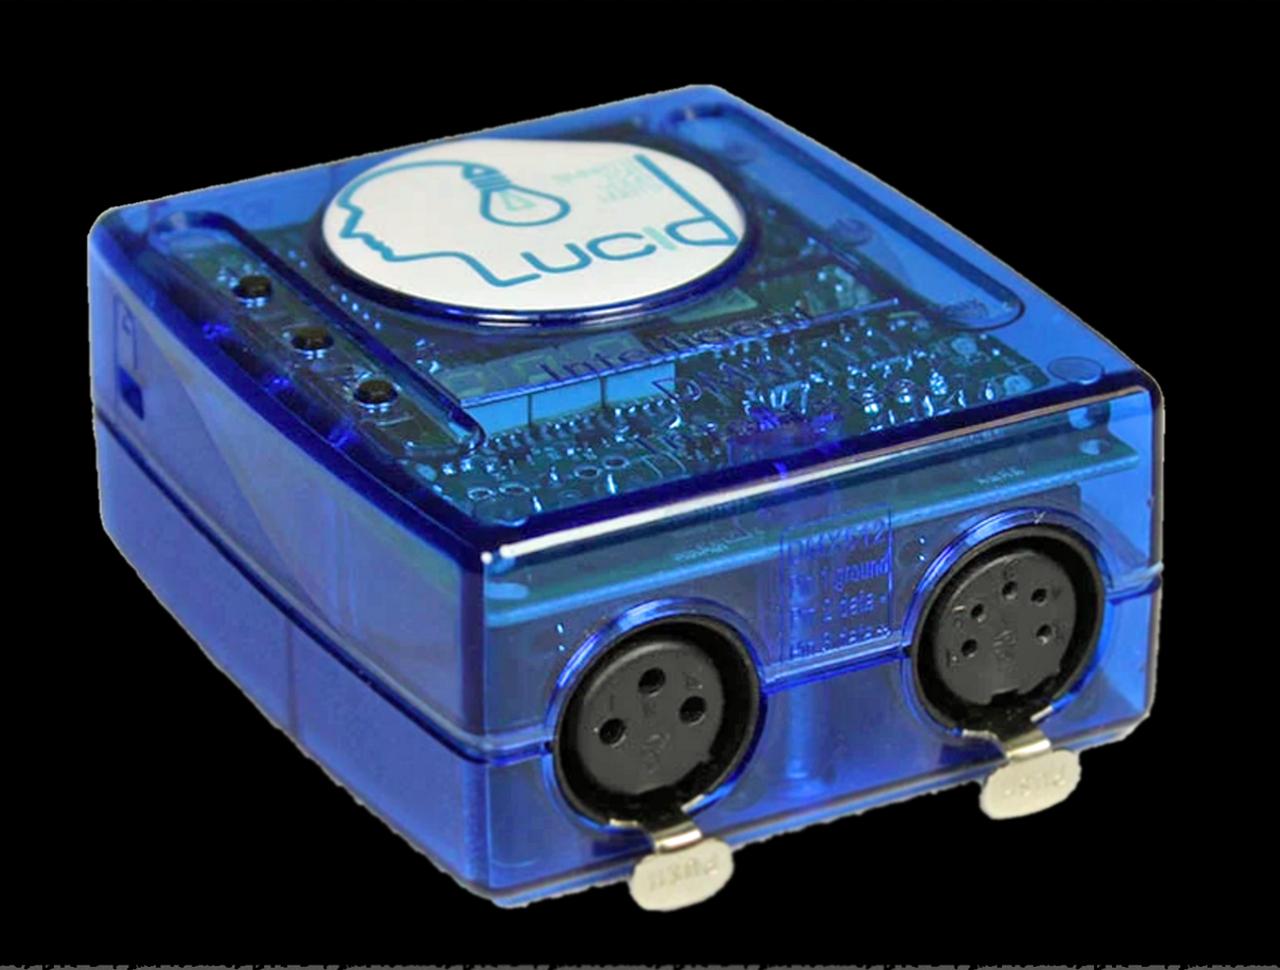 Blizzard Lighting Lucid 180 IQ DMX / Software + USB-DMX Interface